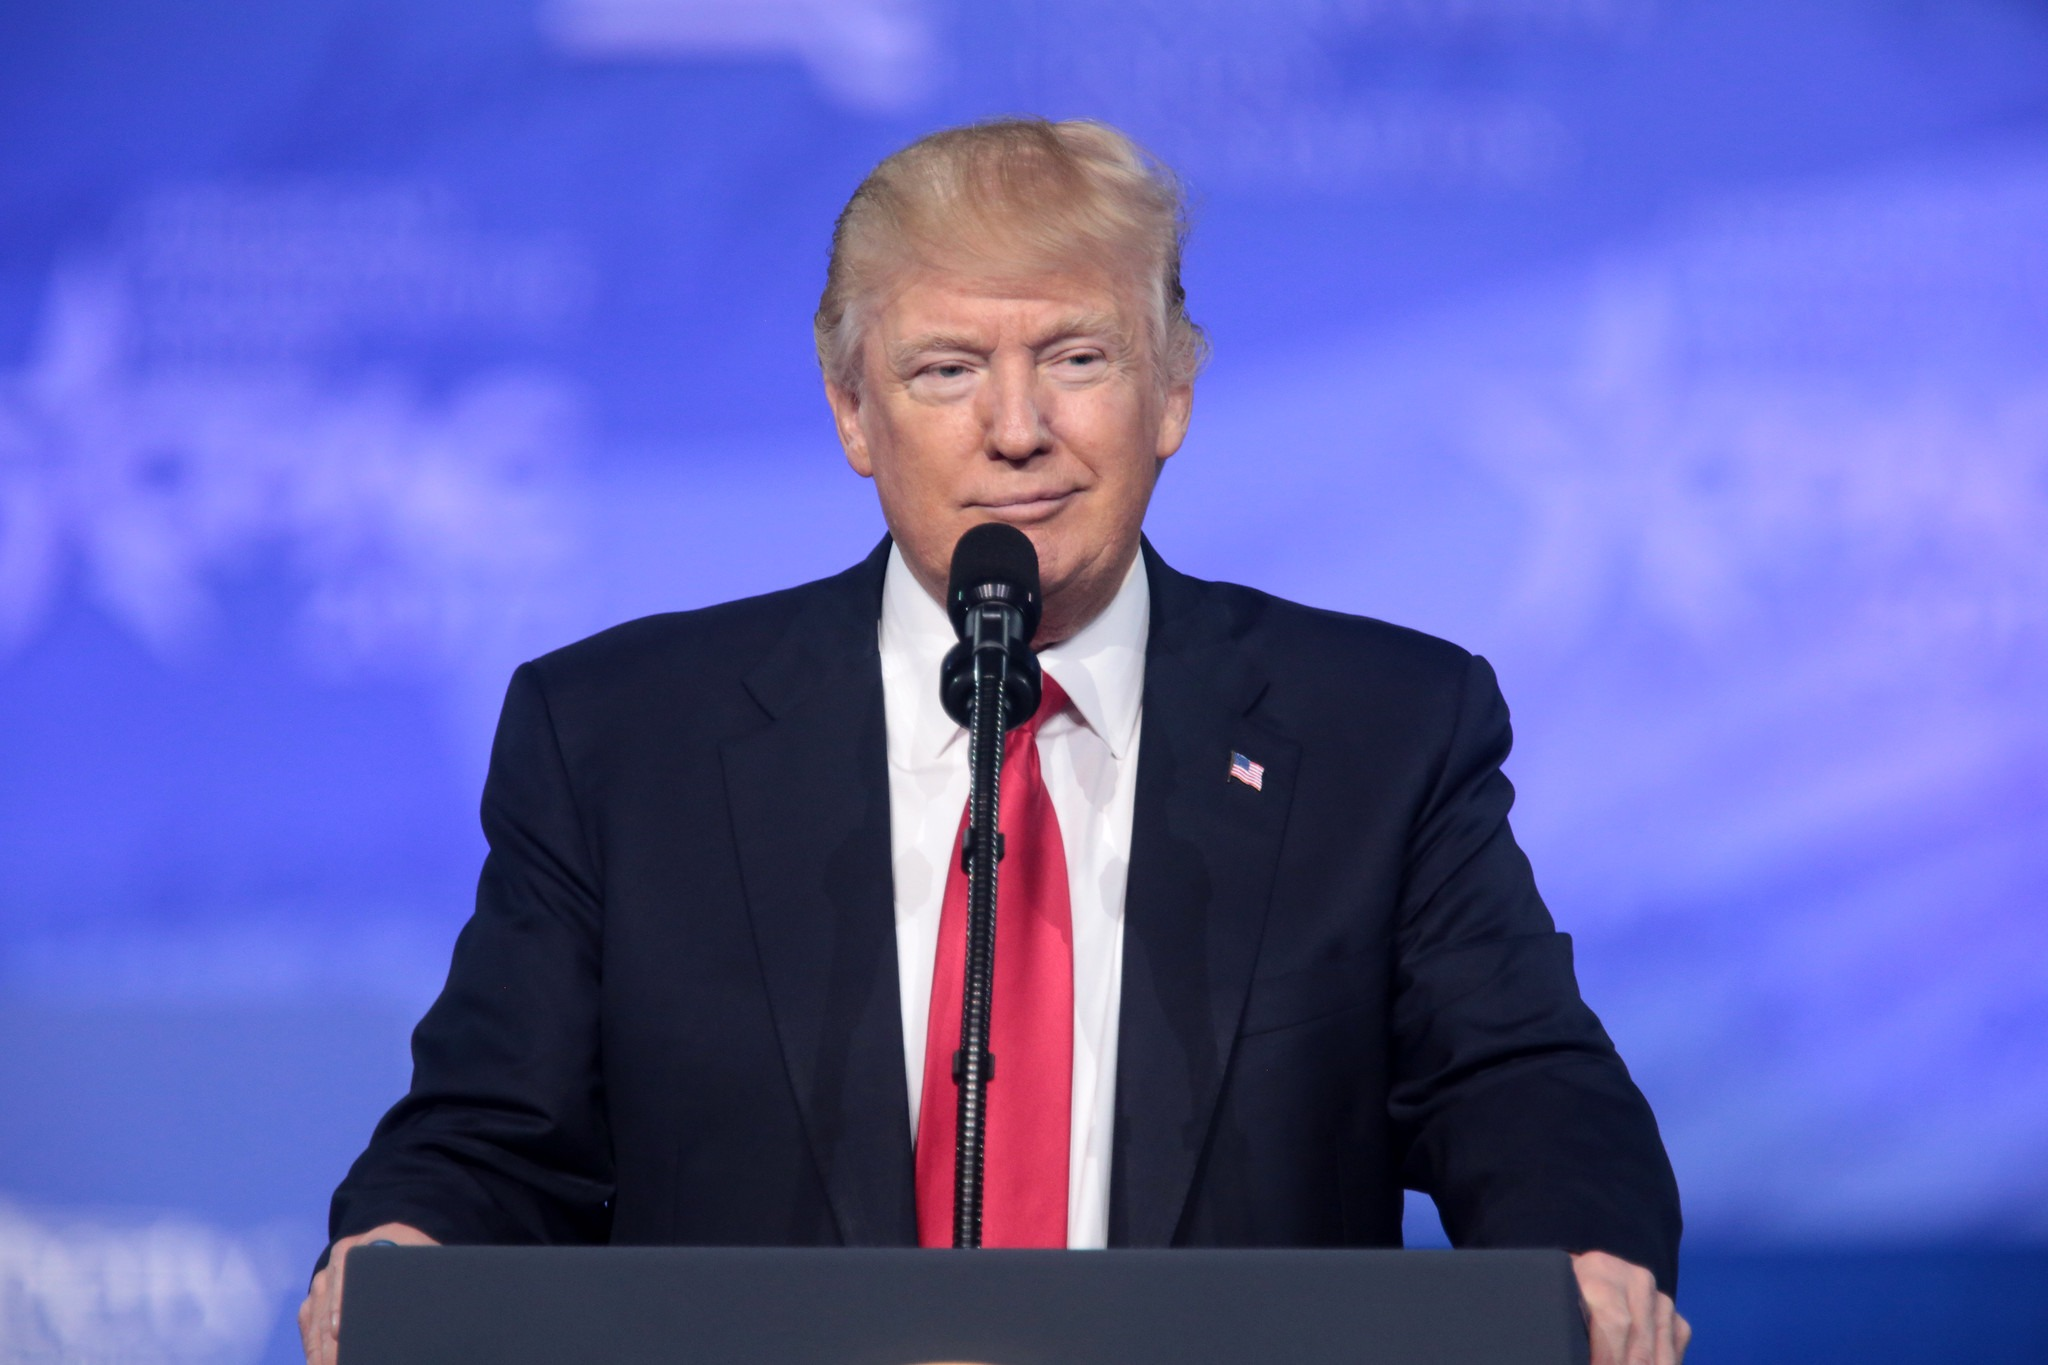 donald_trump_präsident_us_usa_whitehouse